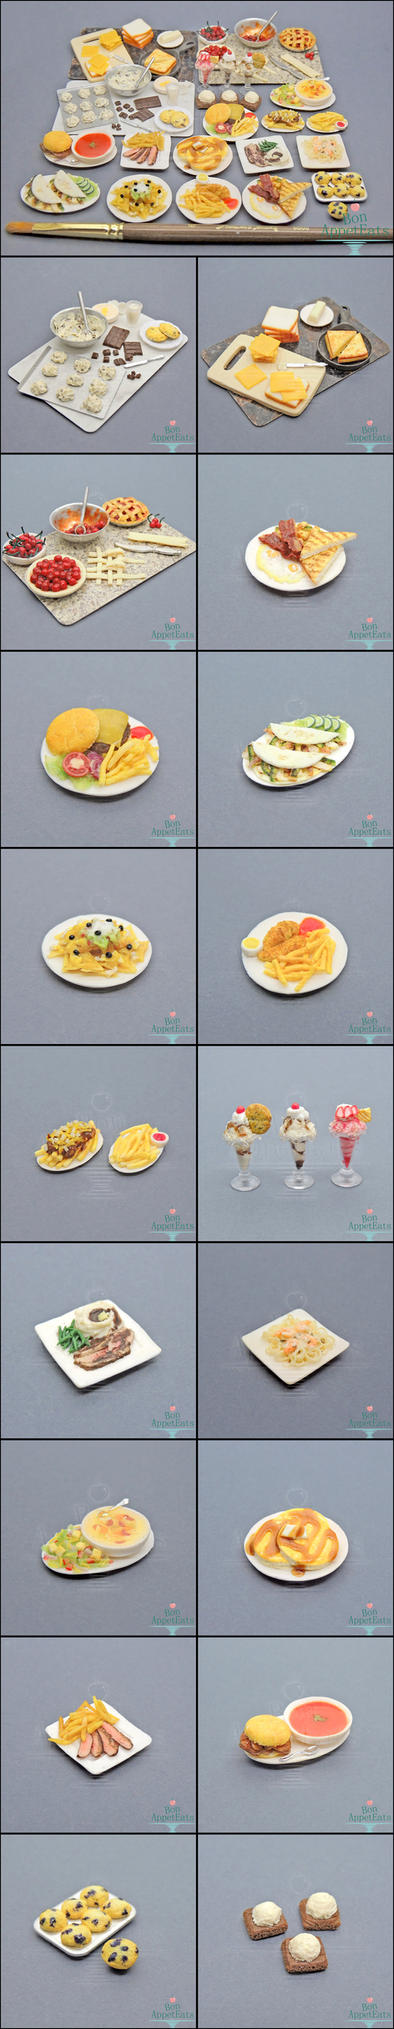 Commission - 1:12 Scale Dollhouse Foods by Bon-AppetEats